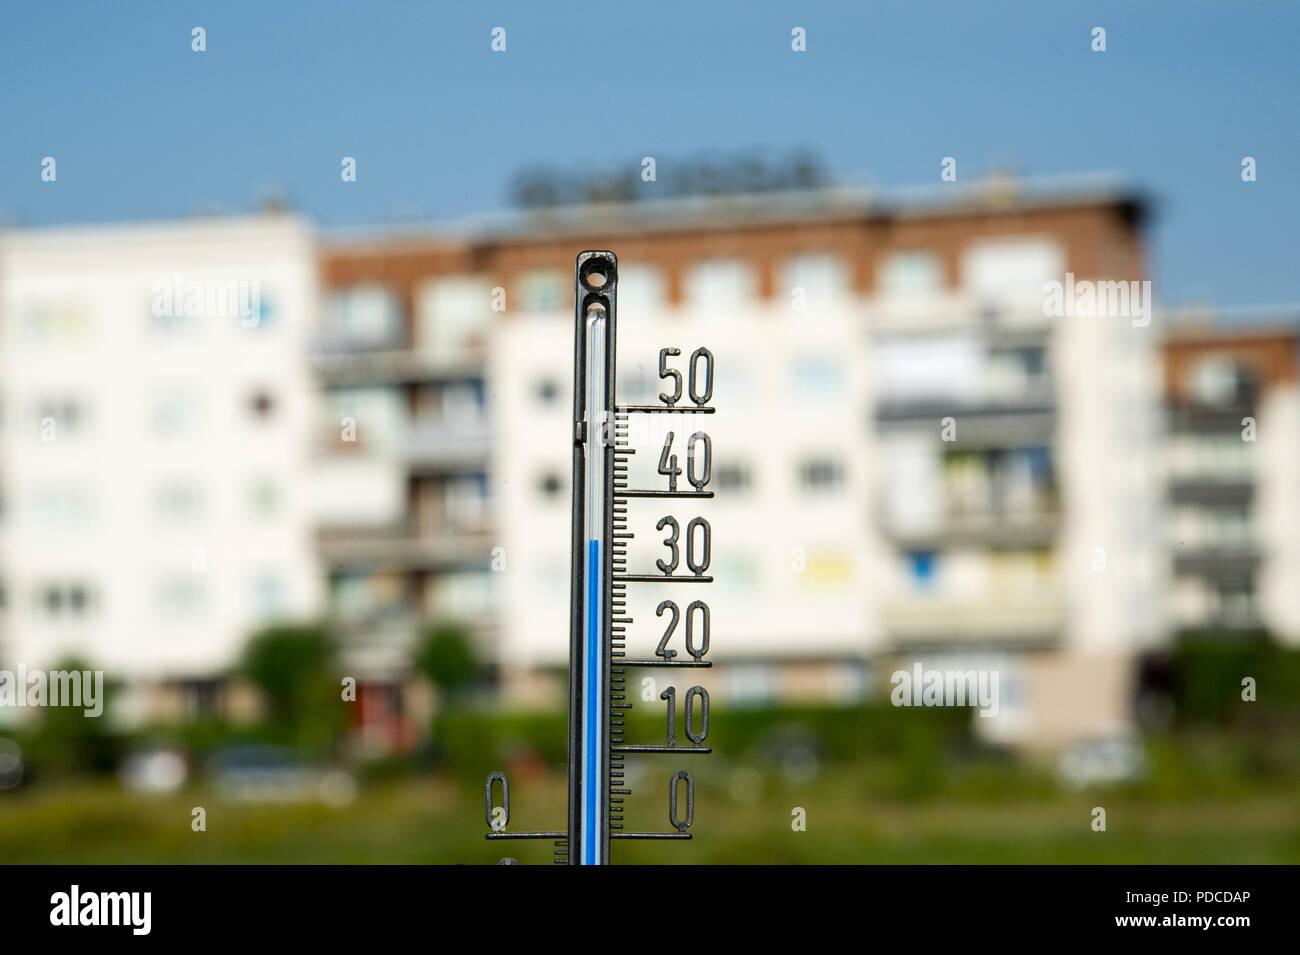 35 Celsius Degrees 95 Fahrenheit In Gdansk Poland August 8th 2018 C Wojciech Strozyk Alamy Live News